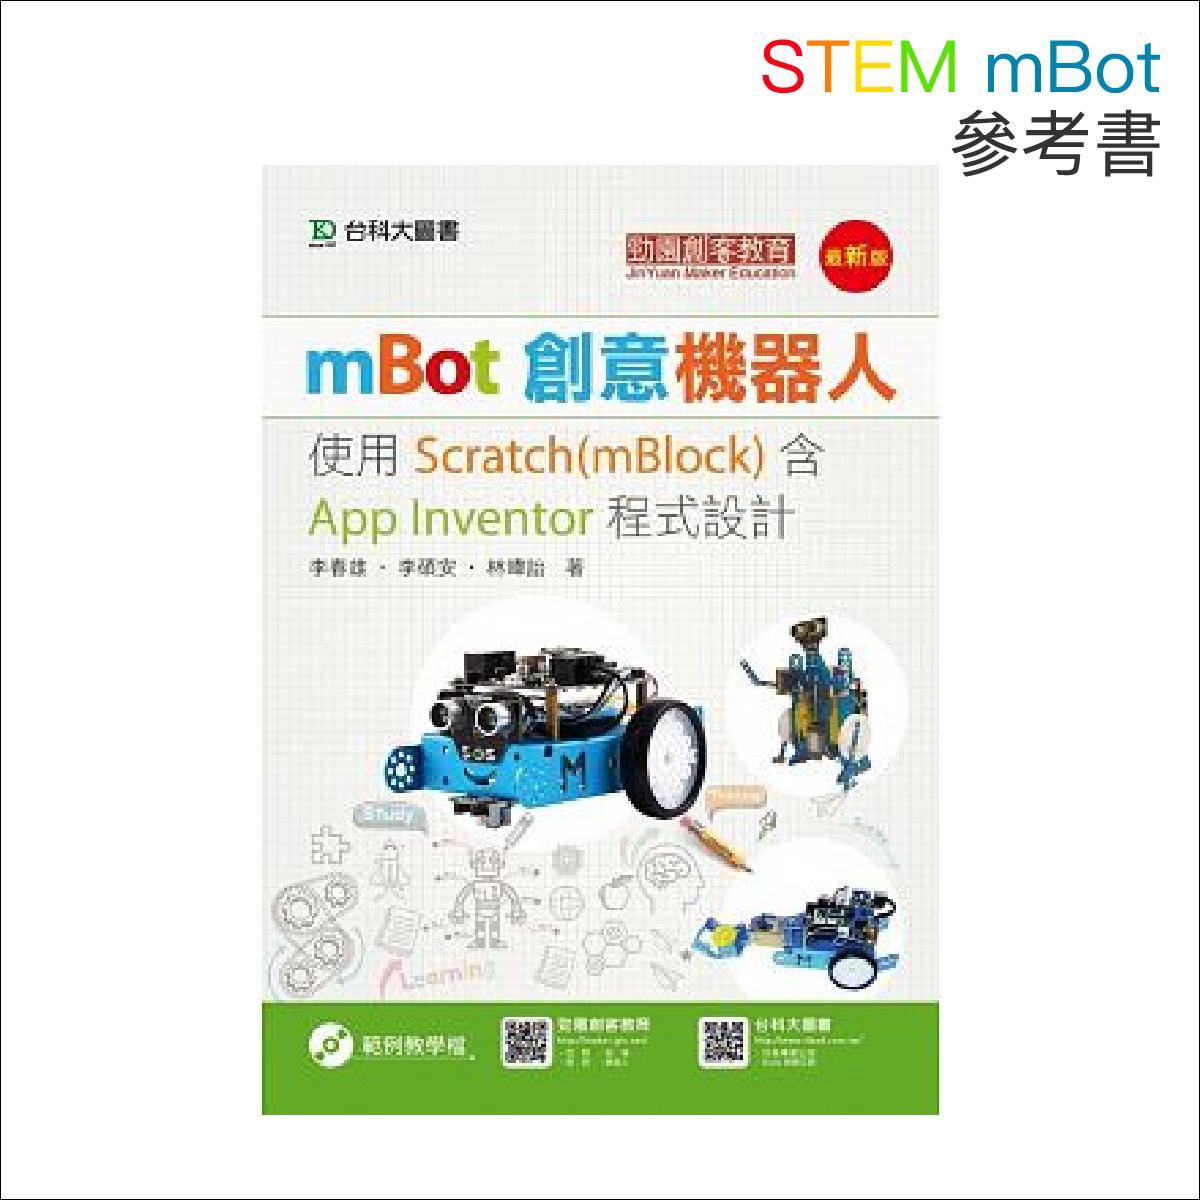 mBot創意機器人:使用Scratch(mBlock)含App Inventor程式設計(最新版) 參考書